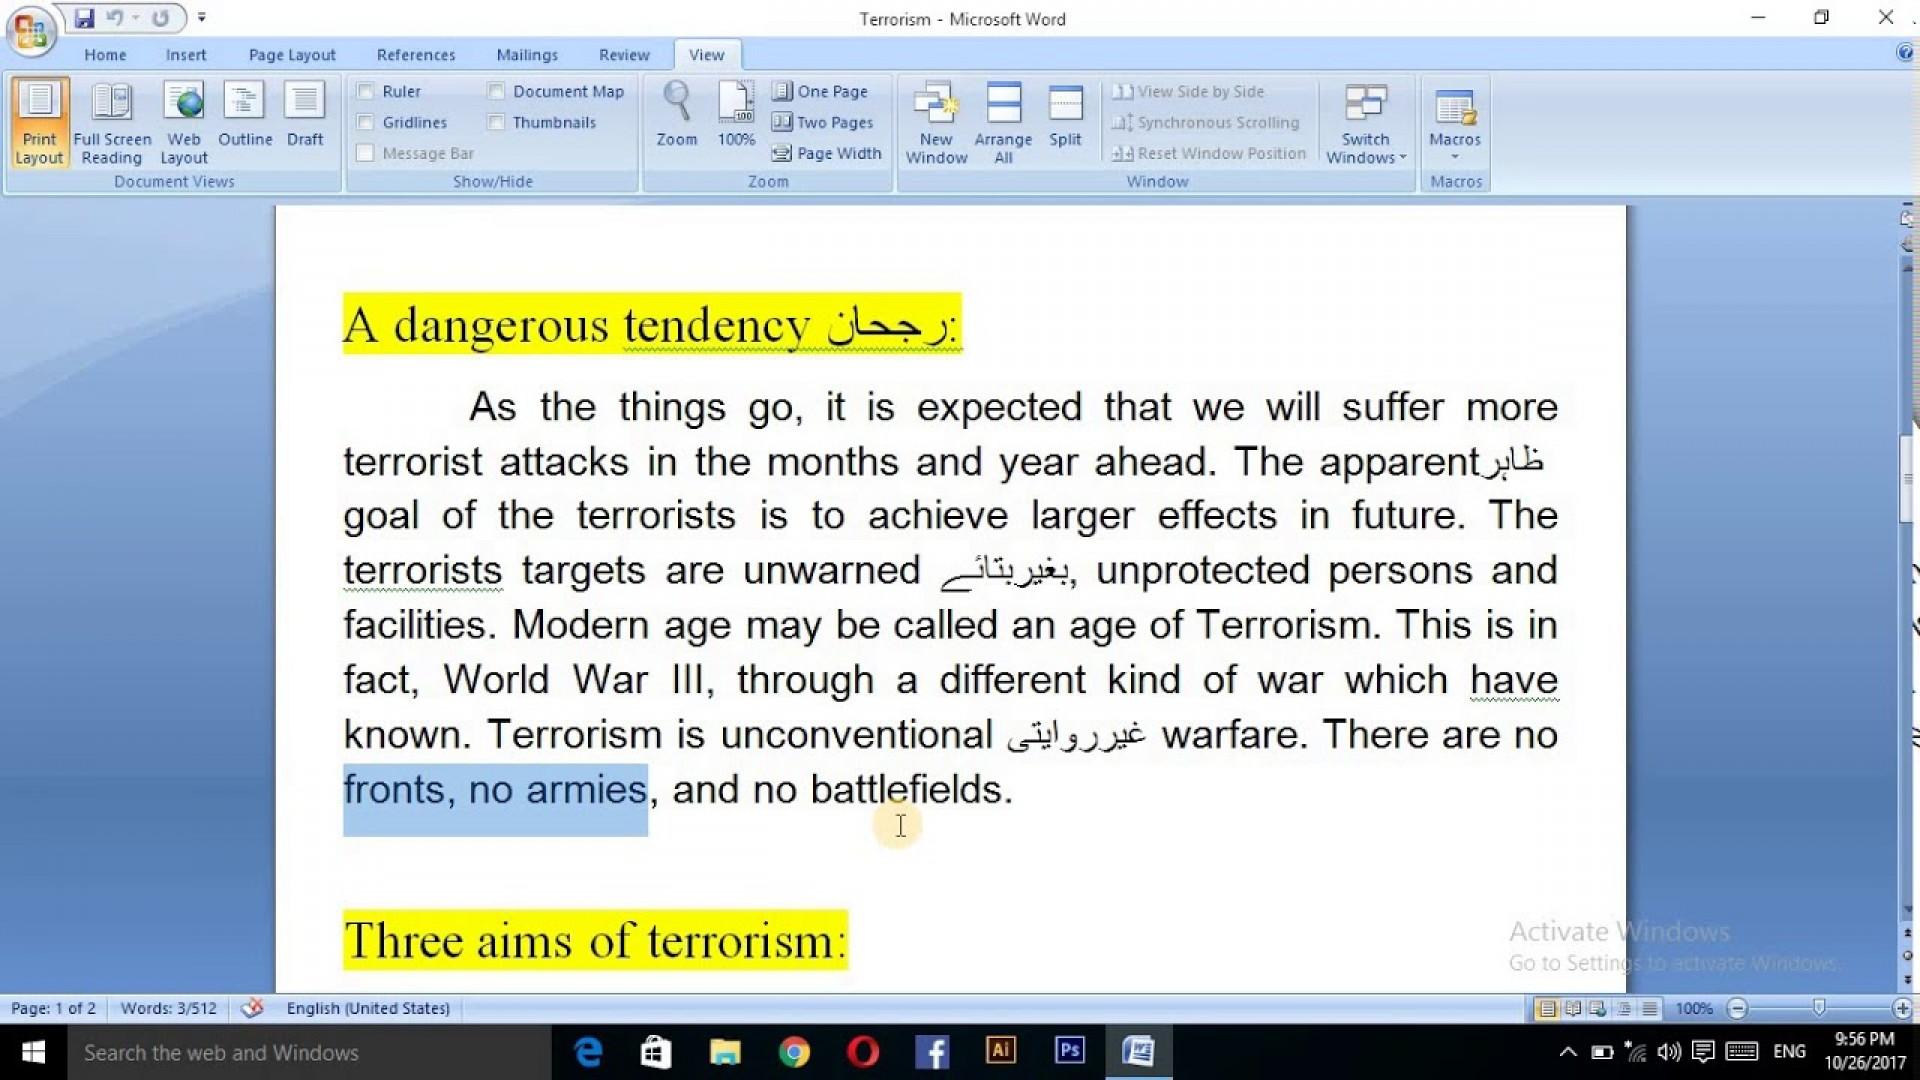 020 Terrorism Essay Example Wonderful Topics In English War On 1920